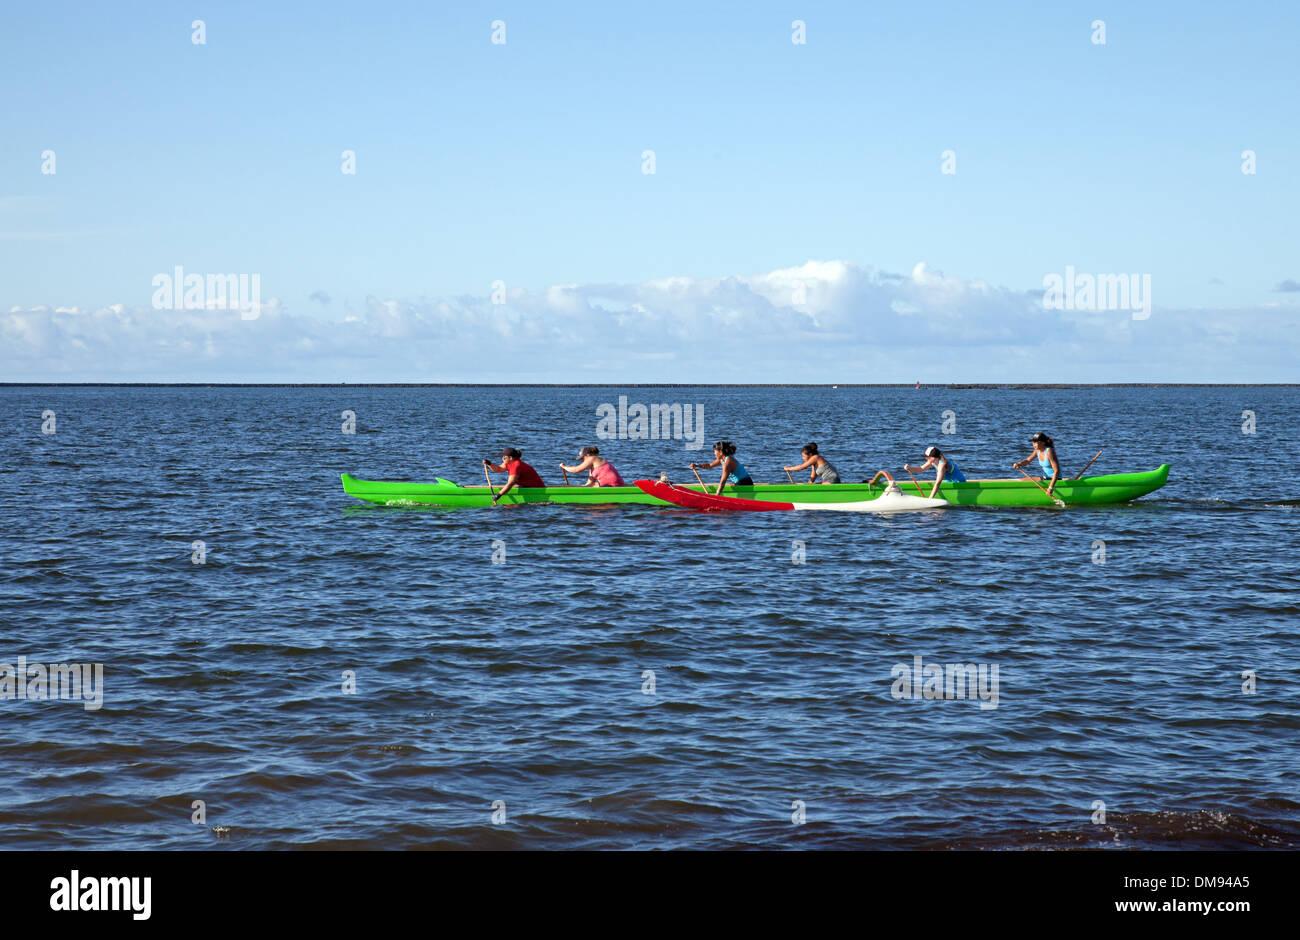 Canoe club practice race on Hilo Bay. - Stock Image